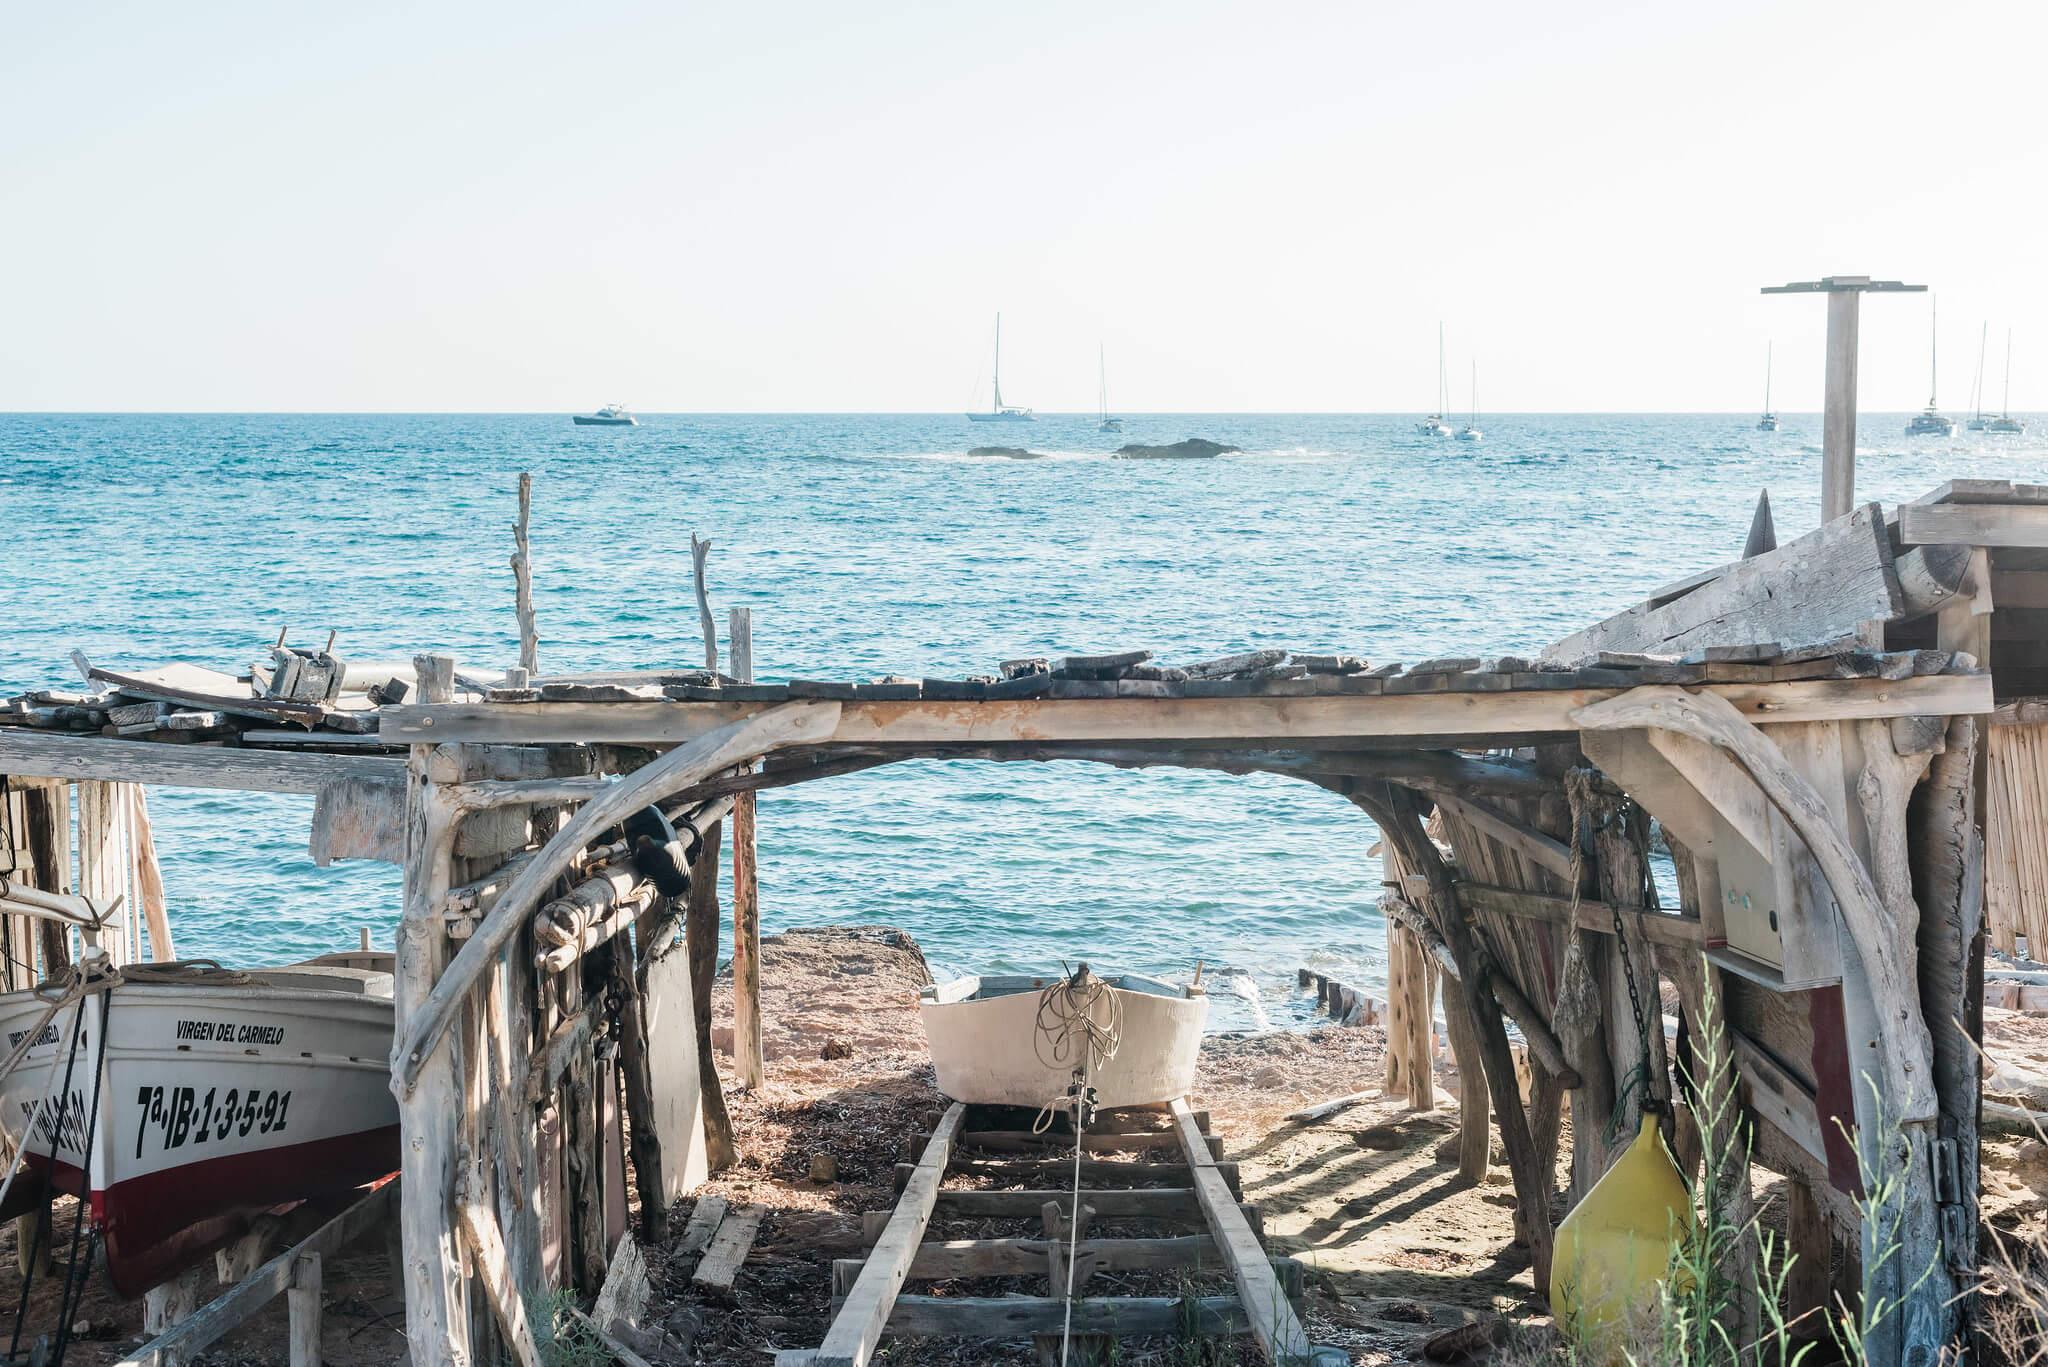 https://www.white-ibiza.com/wp-content/uploads/2020/03/formentera-beaches-es-pujols-2020-03.jpg